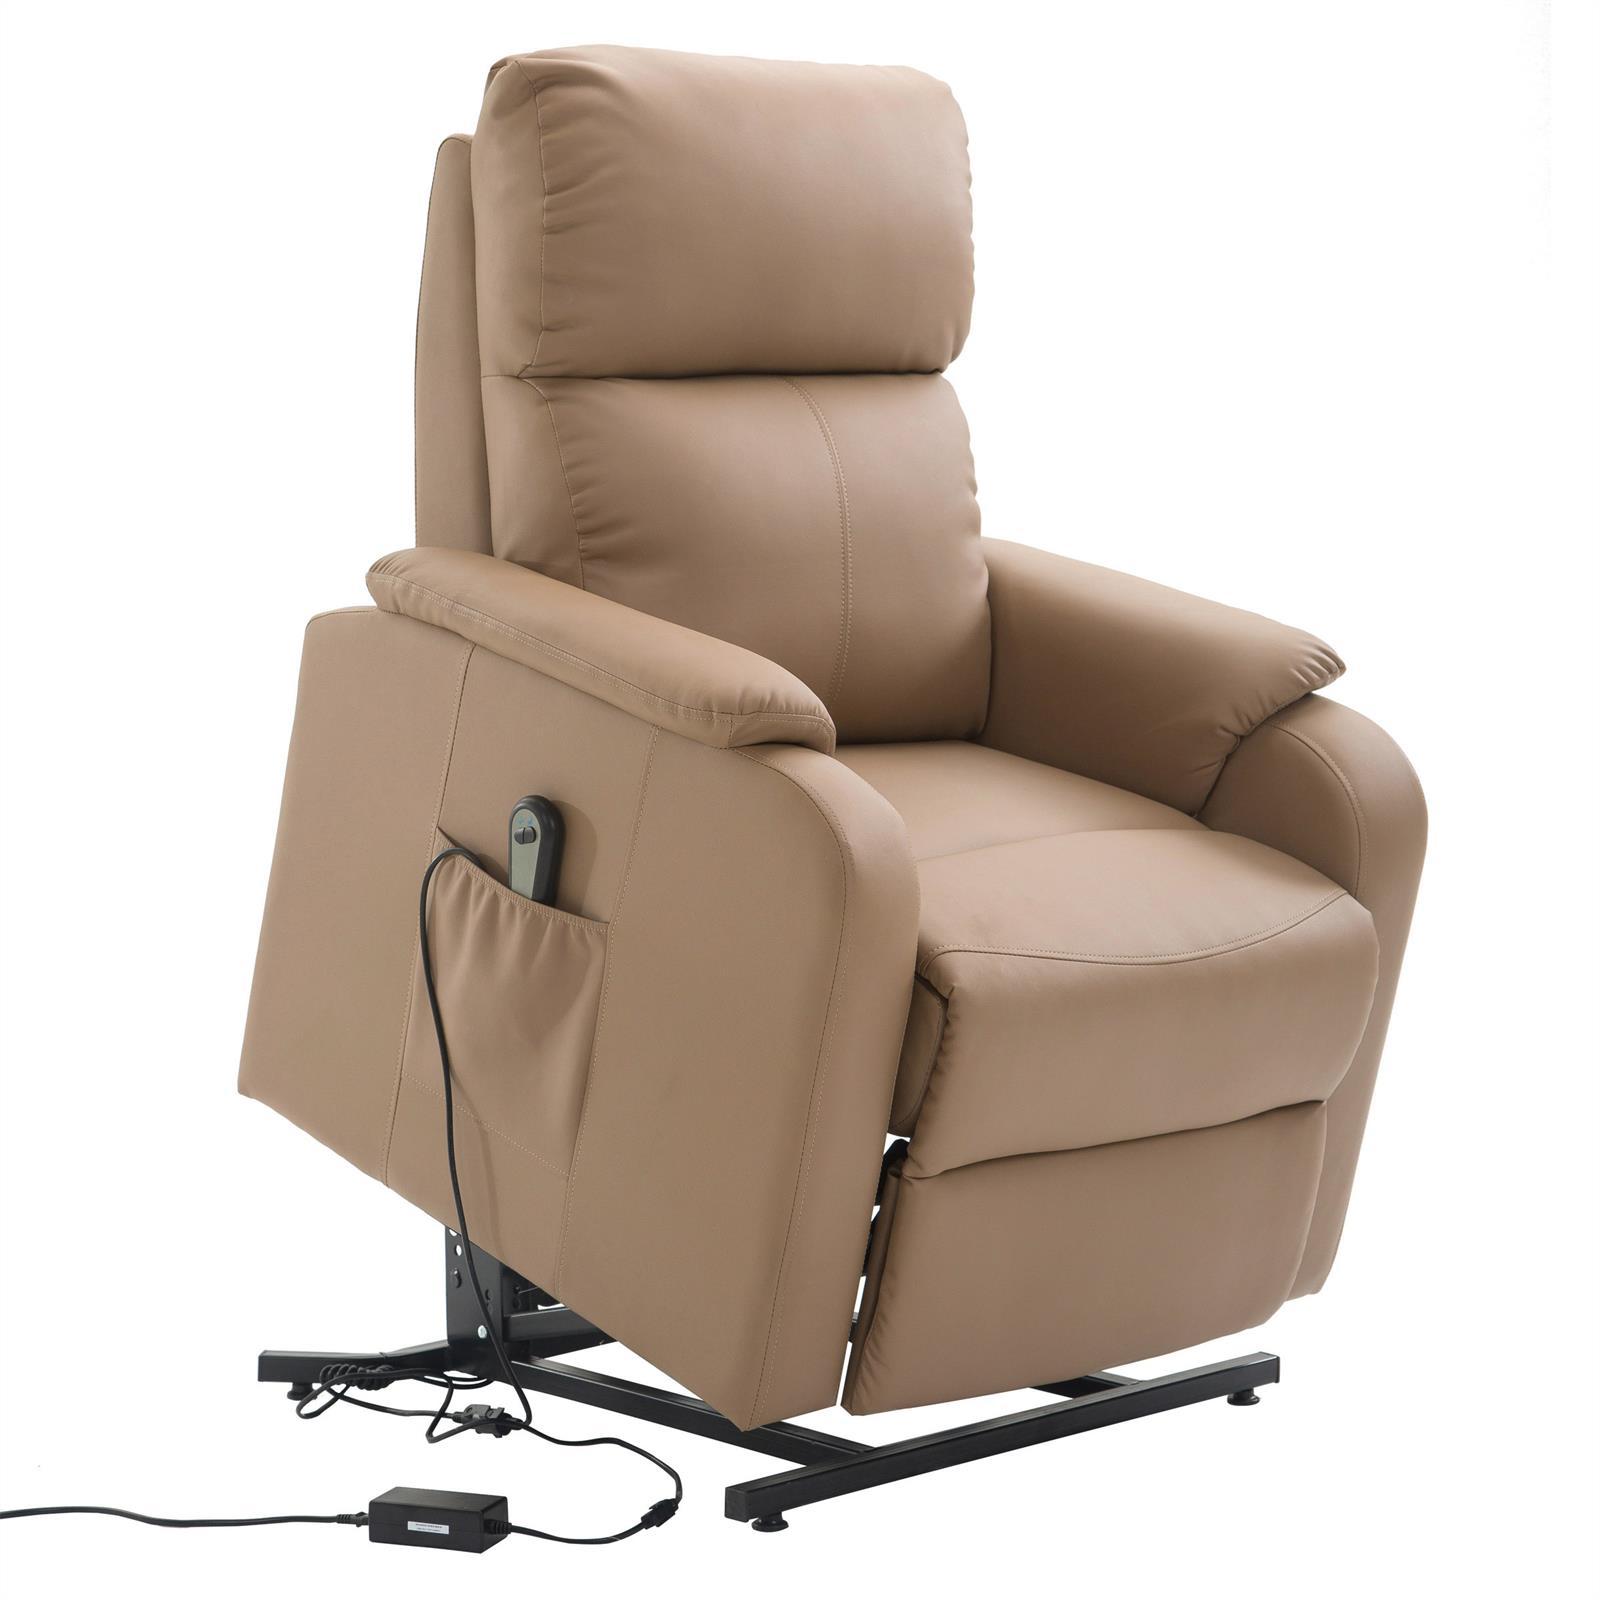 tv sessel elektrisch tv sessel elektrisch leder carprola for tv sessel elektrisch mit. Black Bedroom Furniture Sets. Home Design Ideas